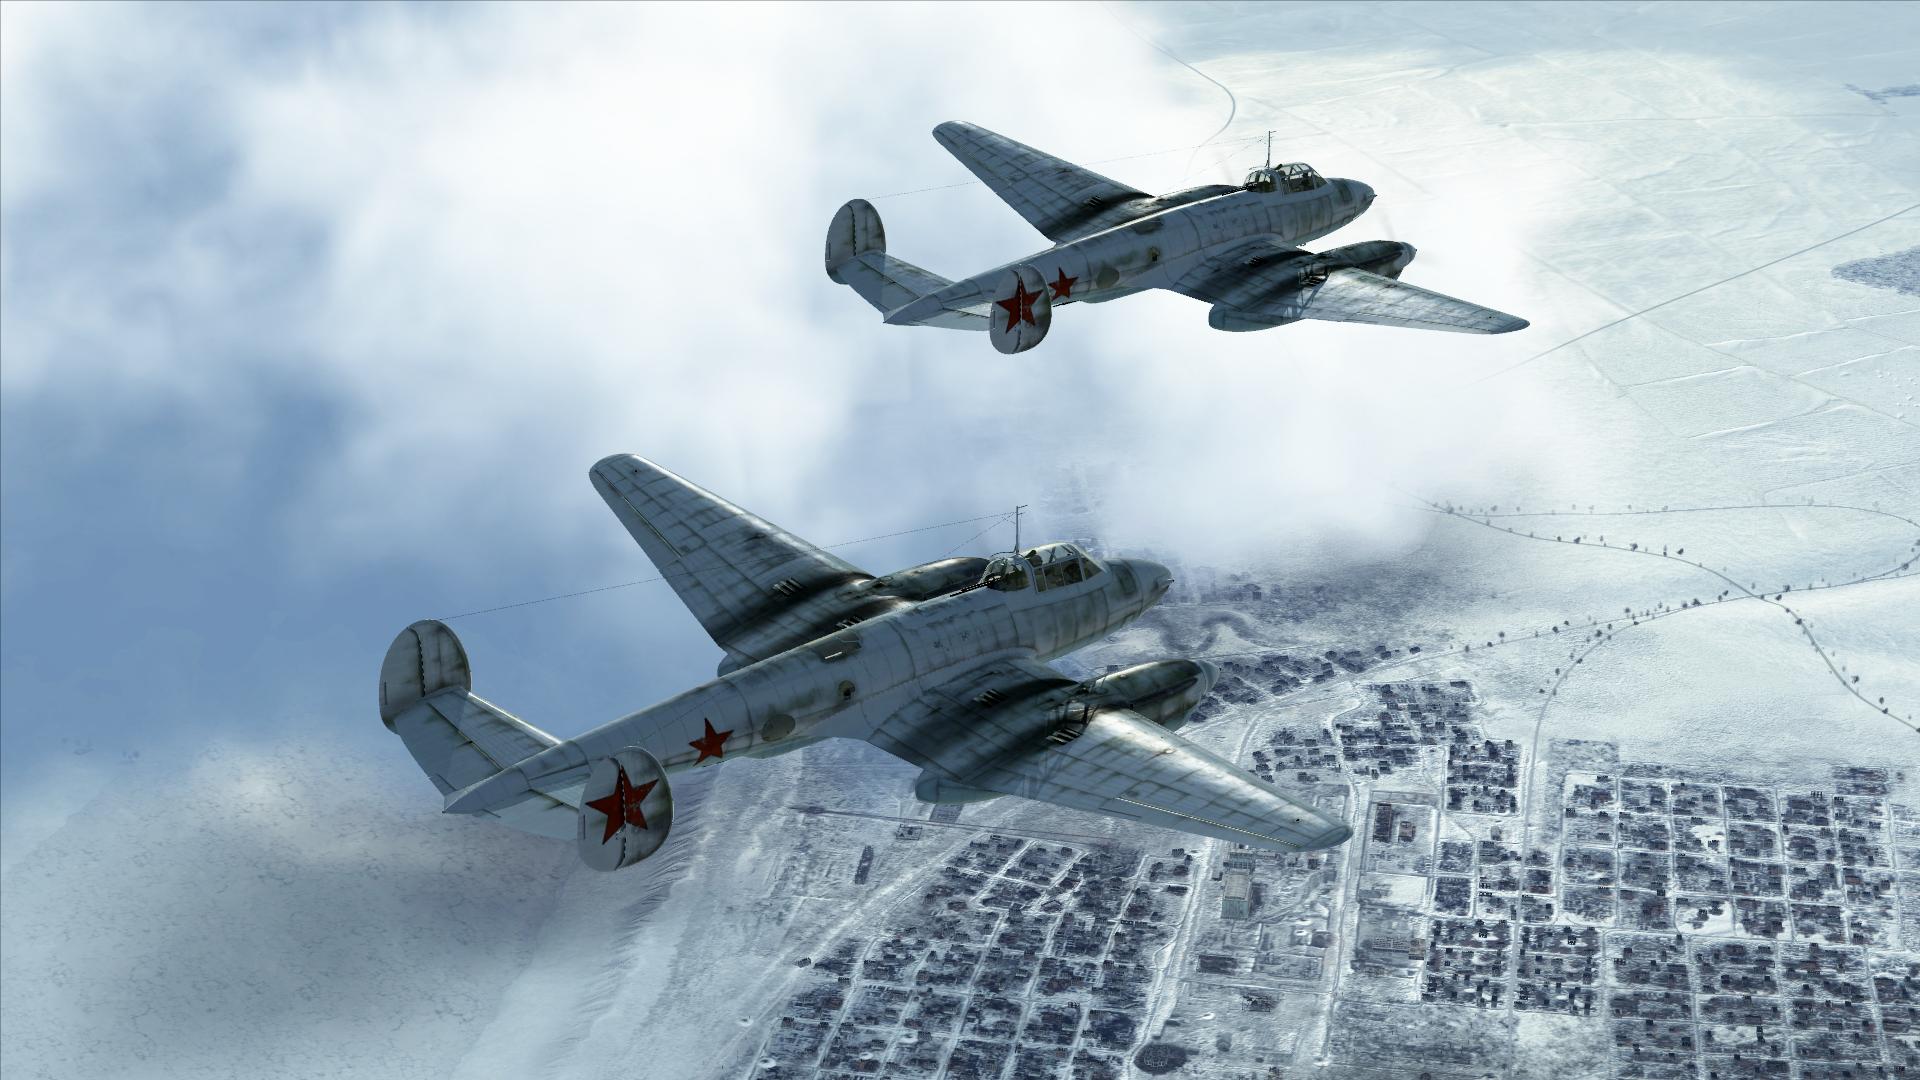 IL-2 Sturmovik: Battle of Stalingrad - game good - The Something